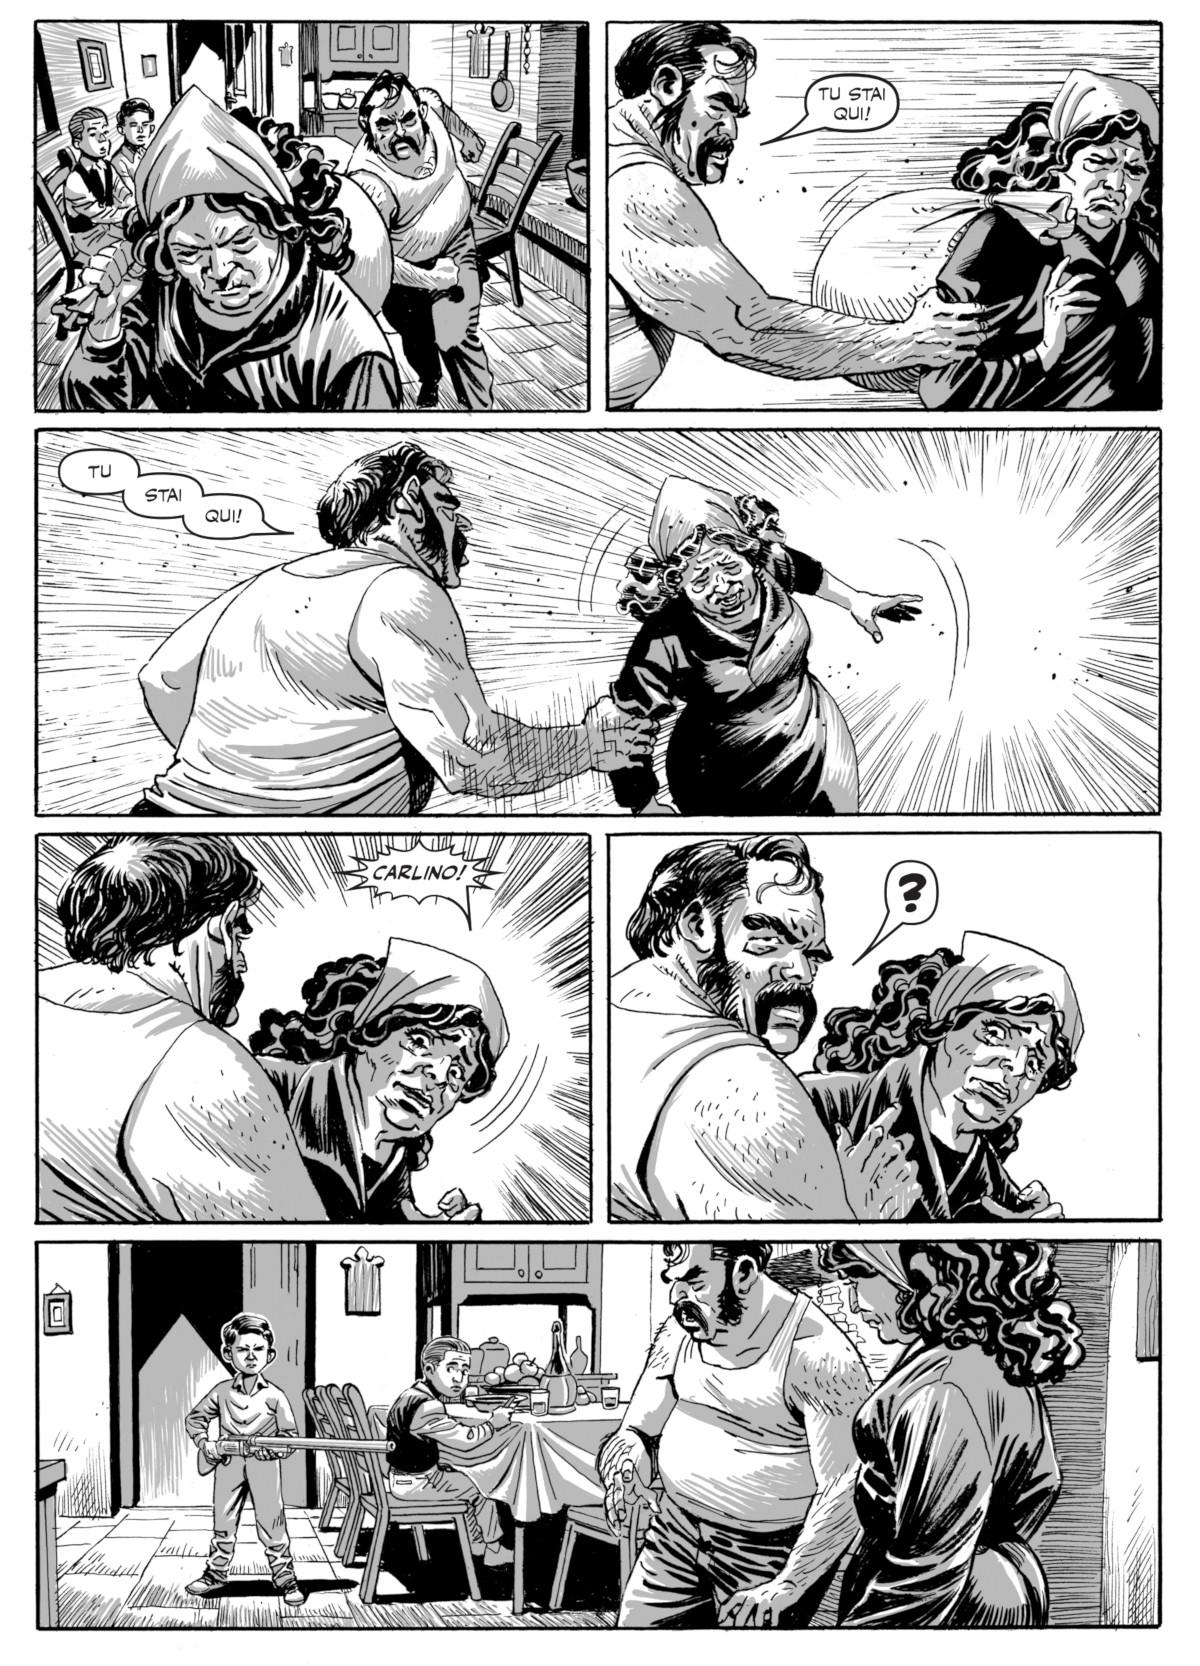 DC_20 Mai tardi, disegni Riccardo Randazzo